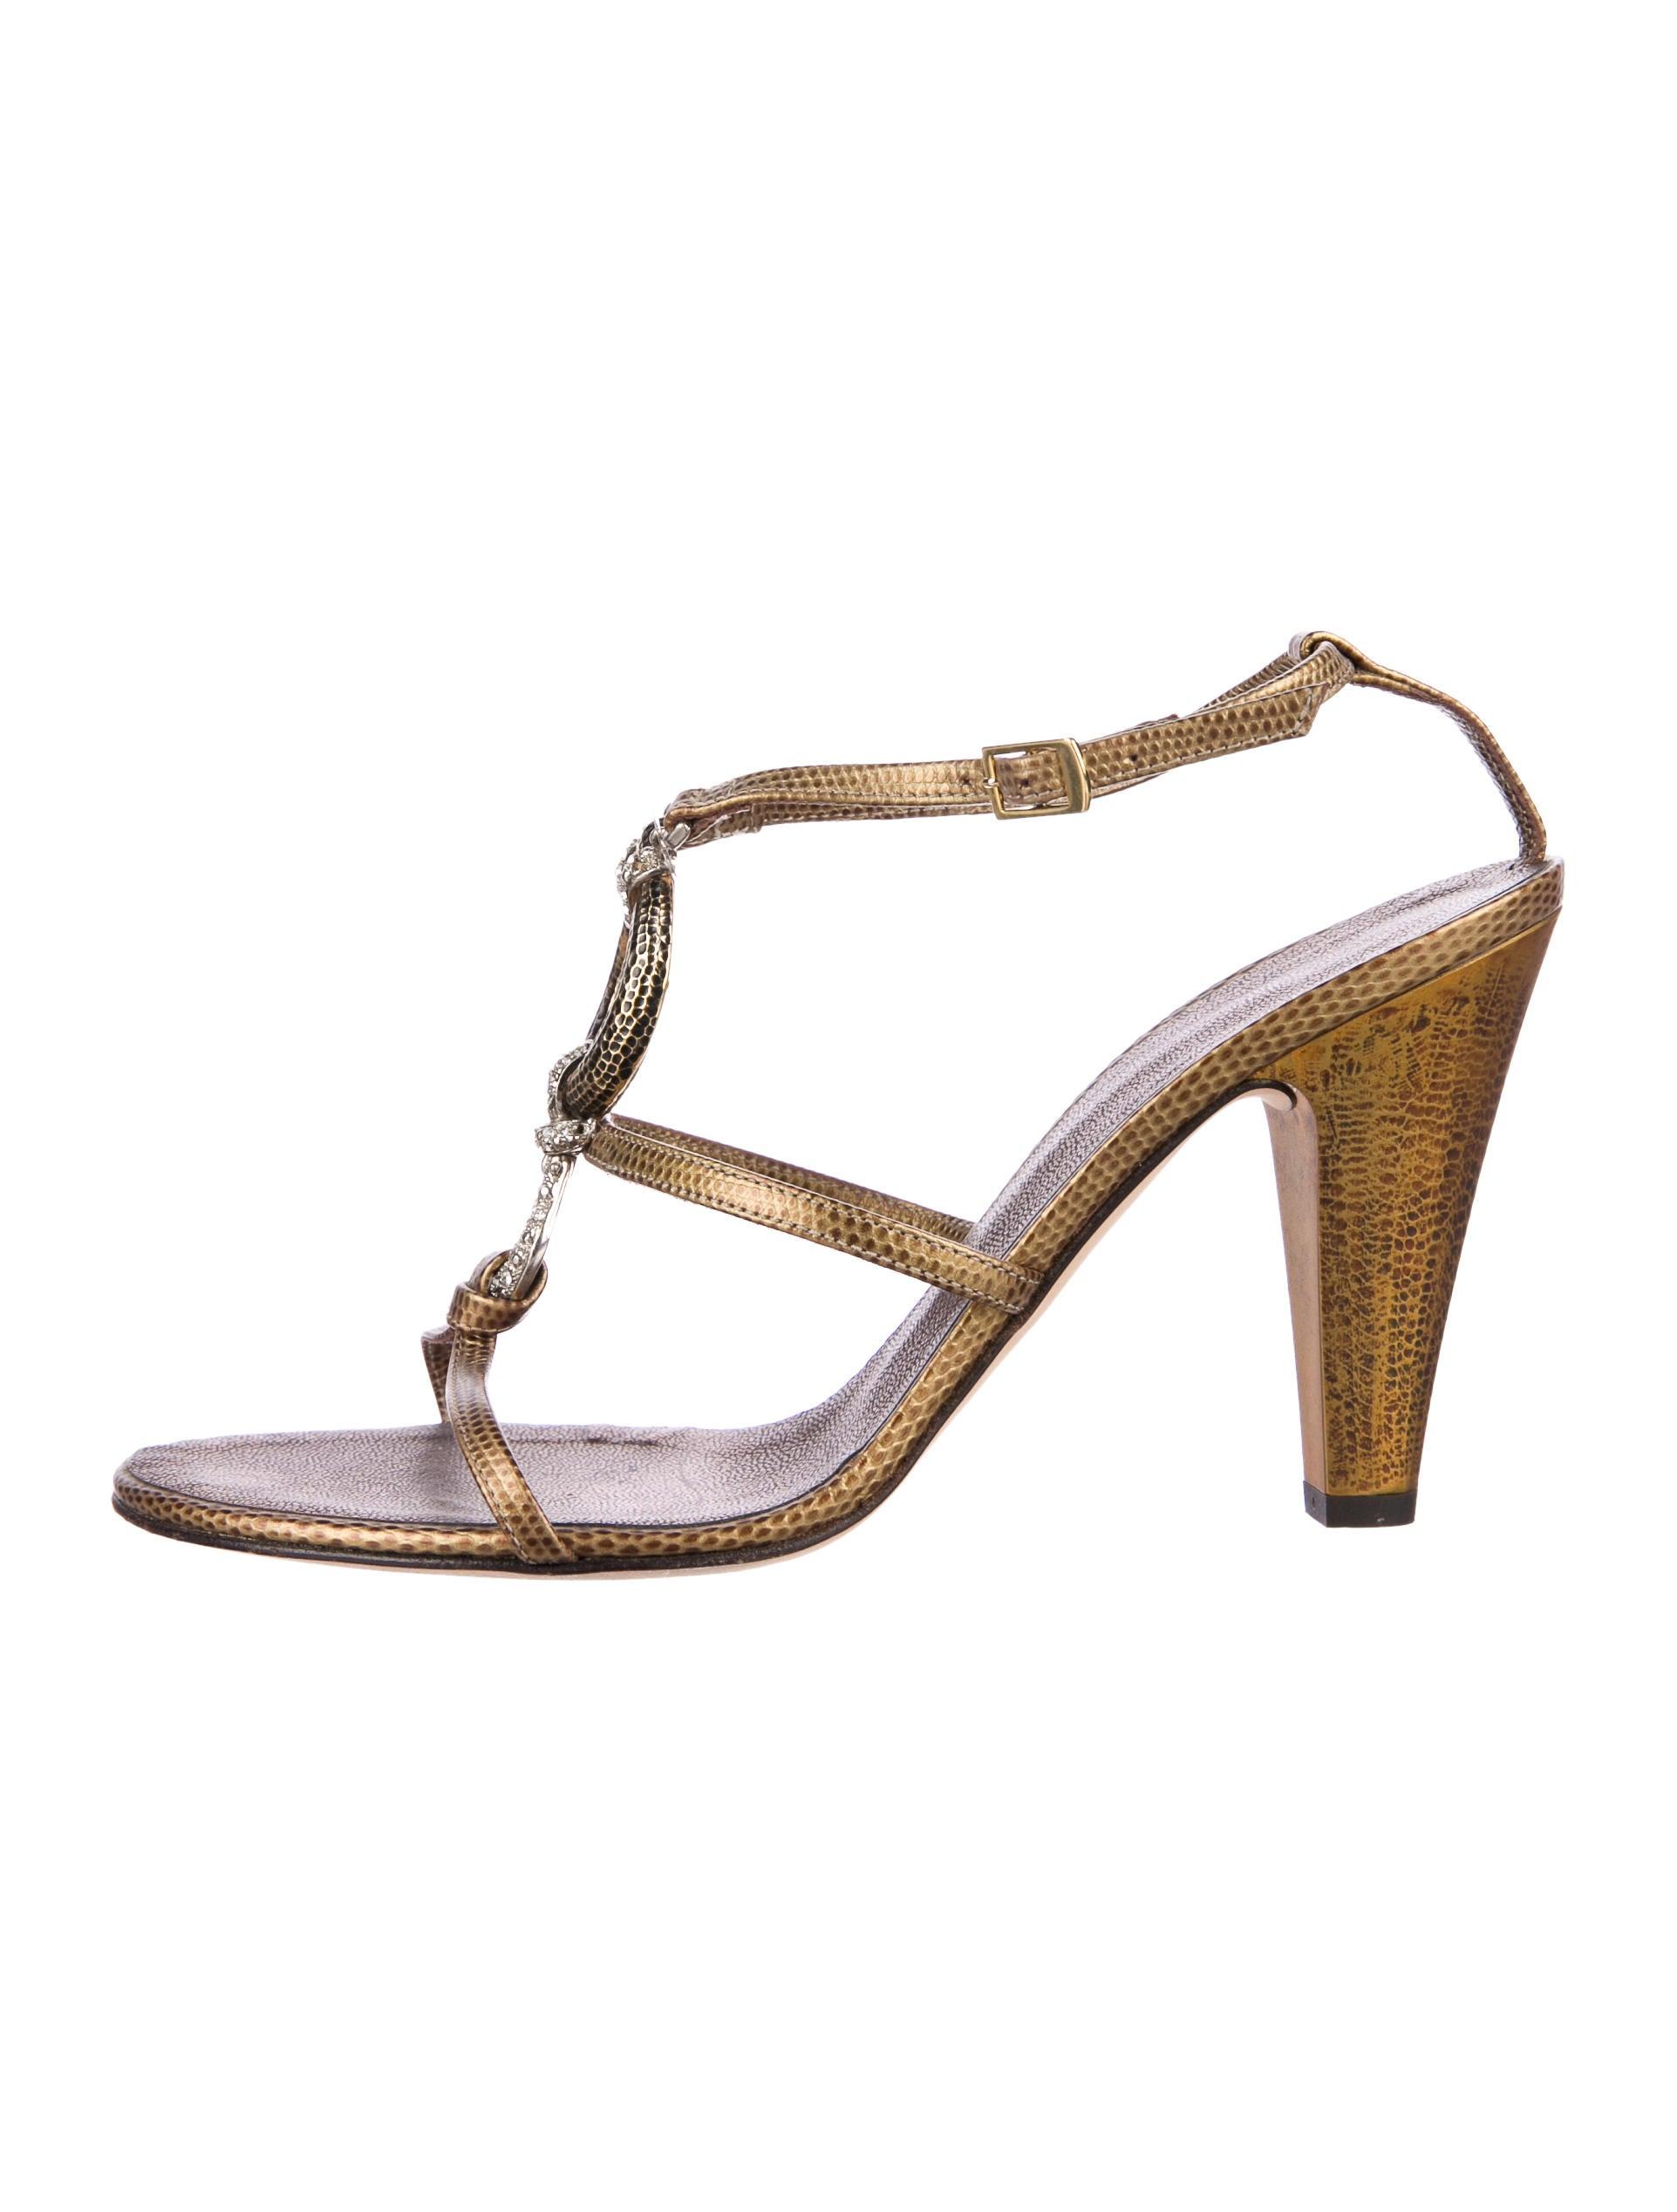 from china cheap price in China cheap online Giuseppe Zanotti Embellished Lizard Sandals KOvZG3jJM